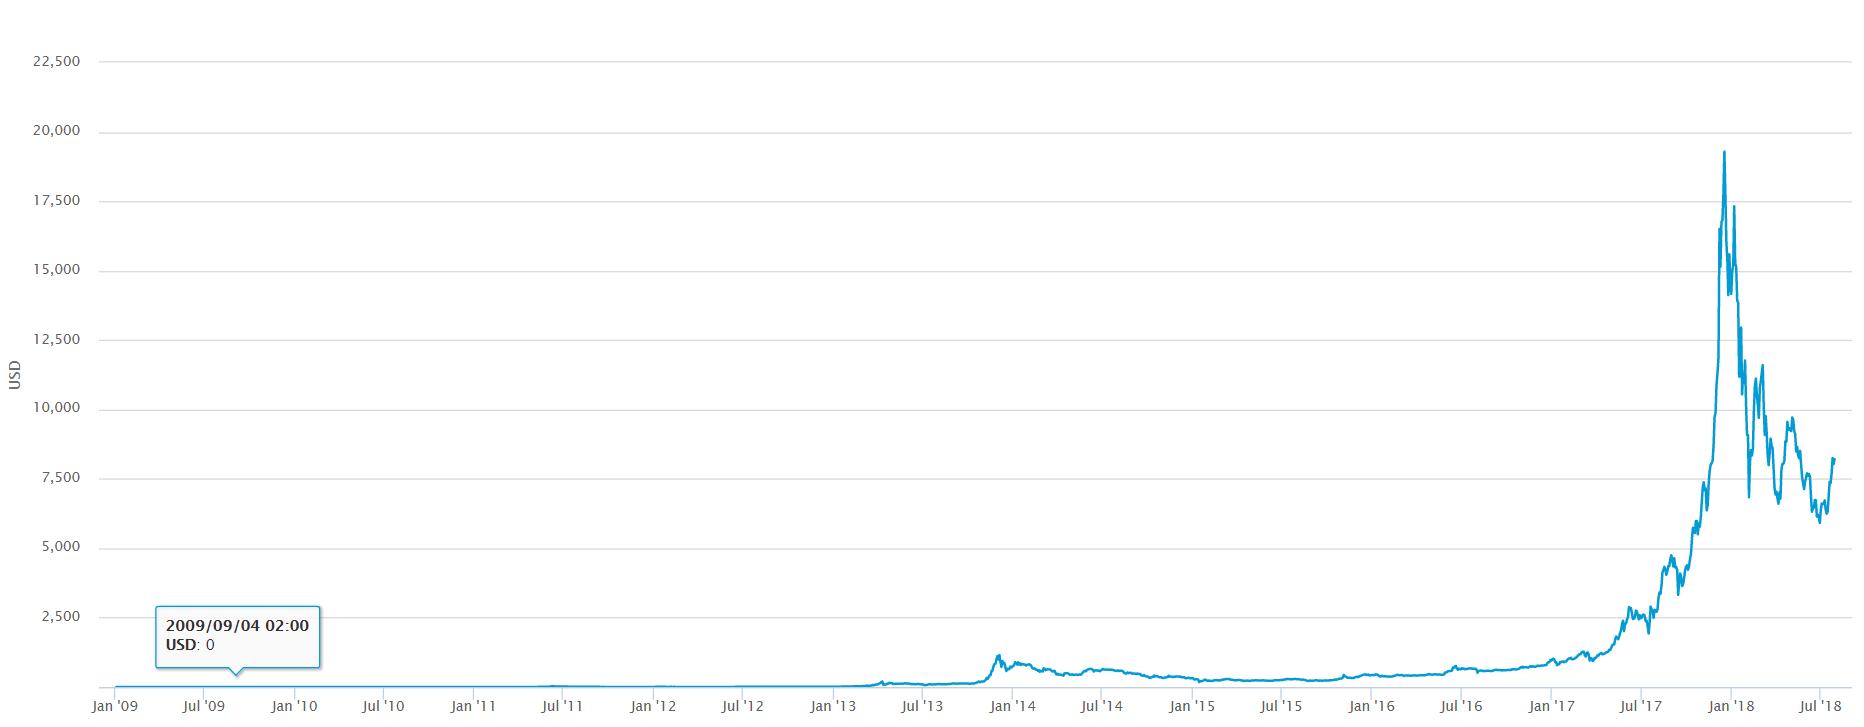 Evolution des prix du bitcoin